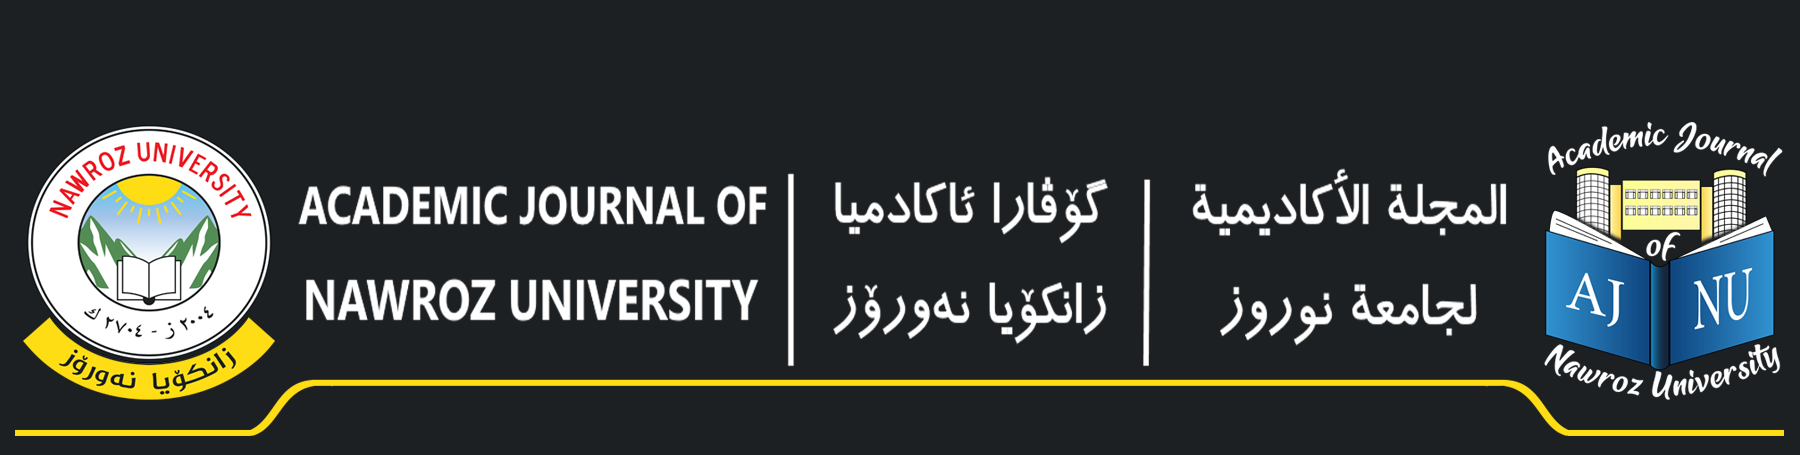 Nawroz University, Academic Journal of Nawroz University, ACAD J NAWROZ U